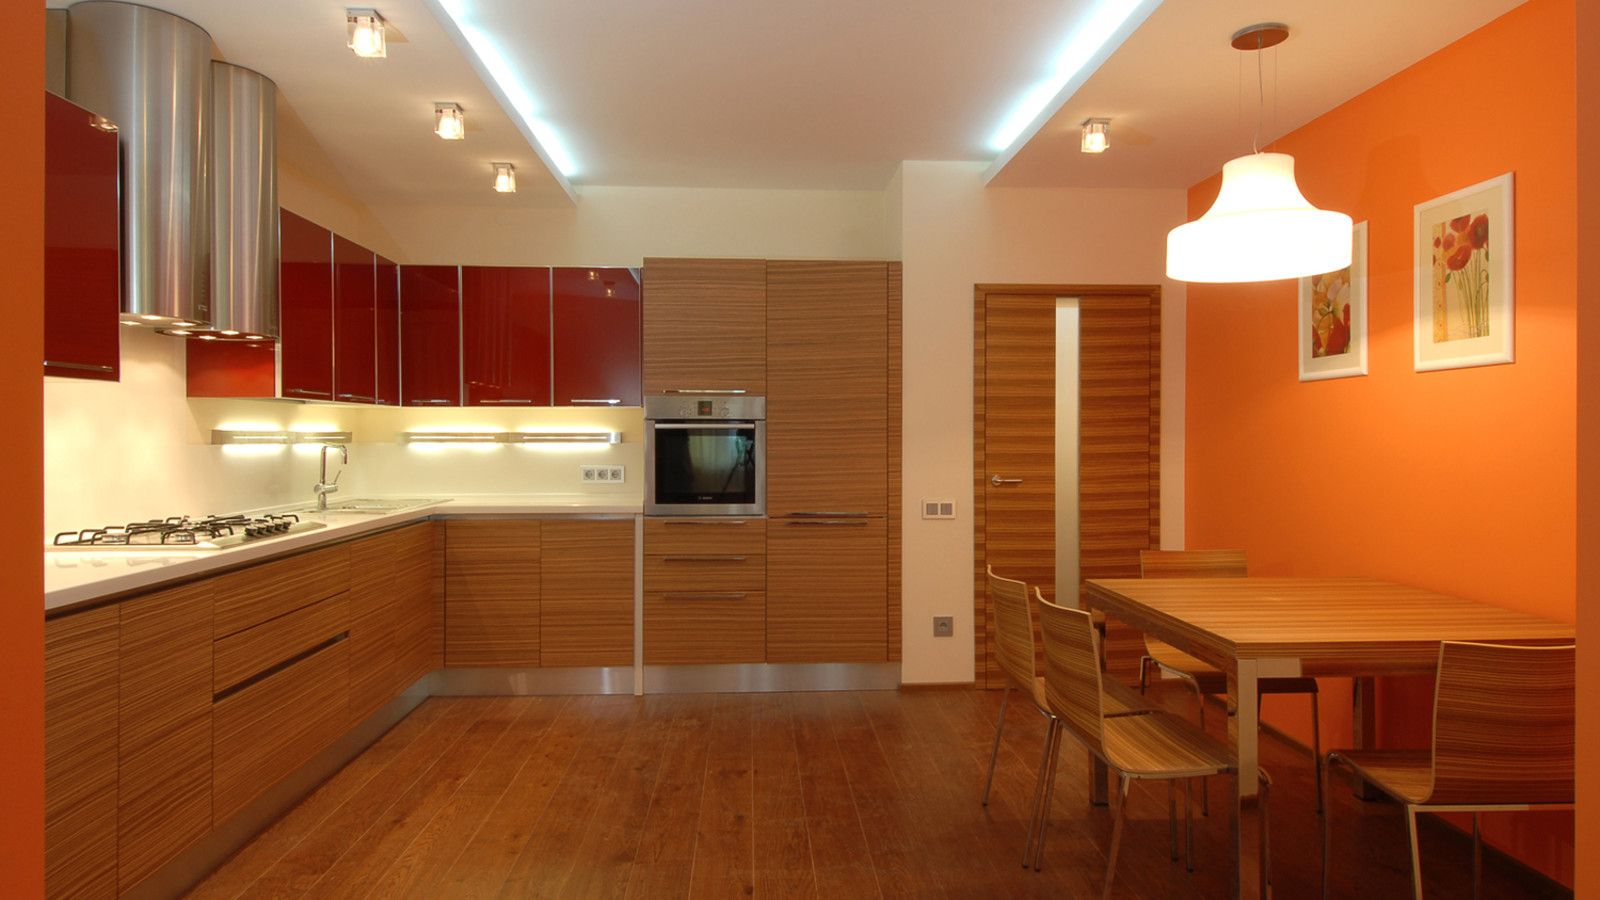 colores para decorar cocinas pequeas buscar con google